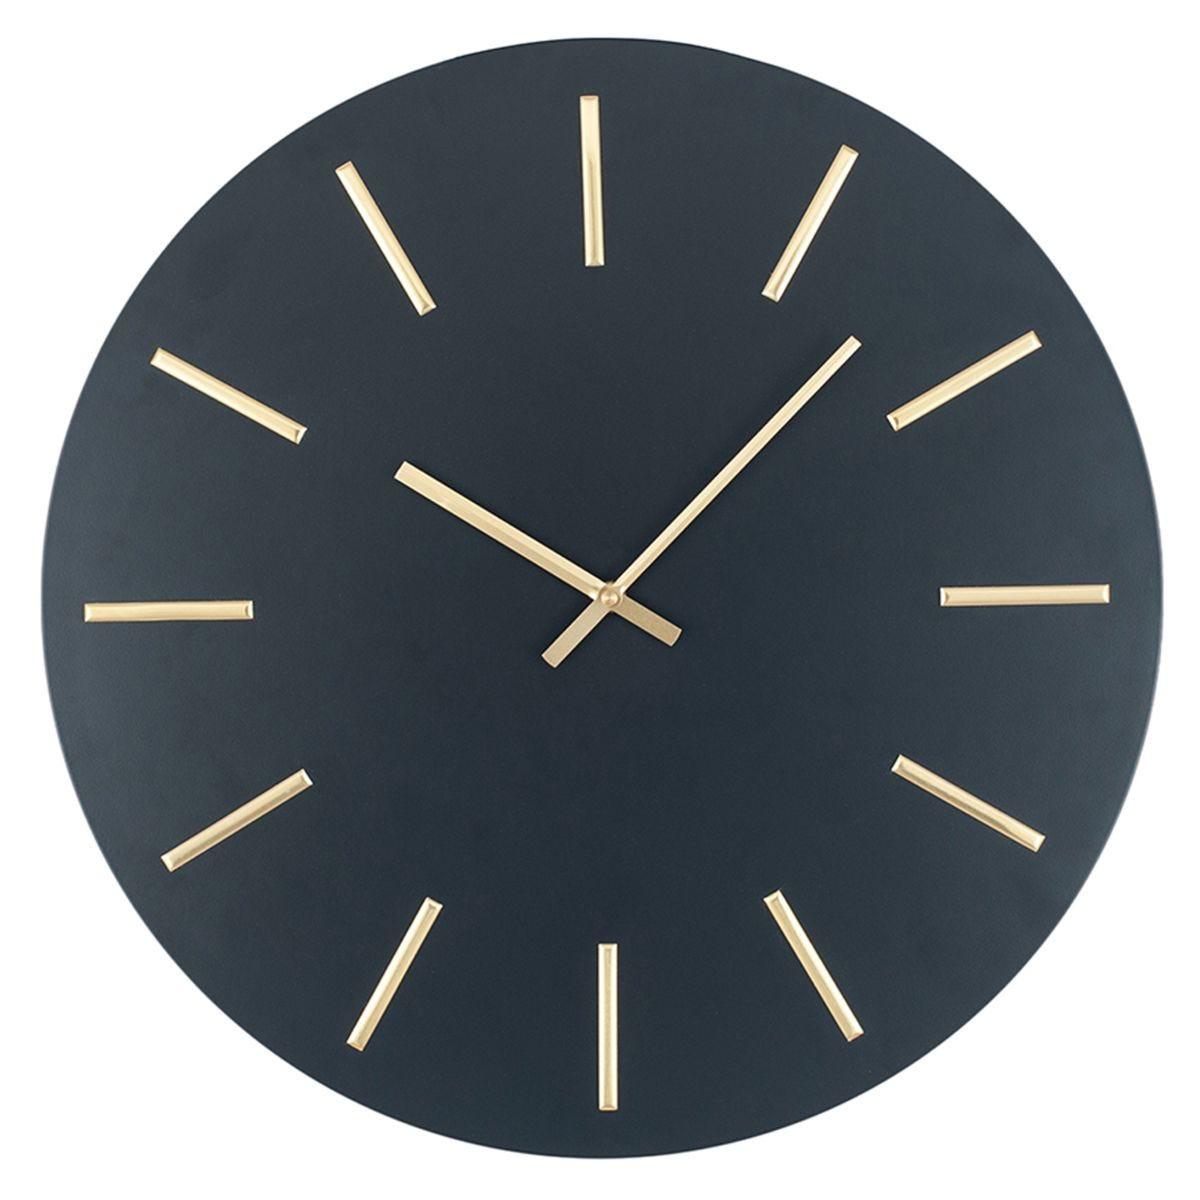 Celestial Matt Black and Gold Detail Round Metal Wall Clock